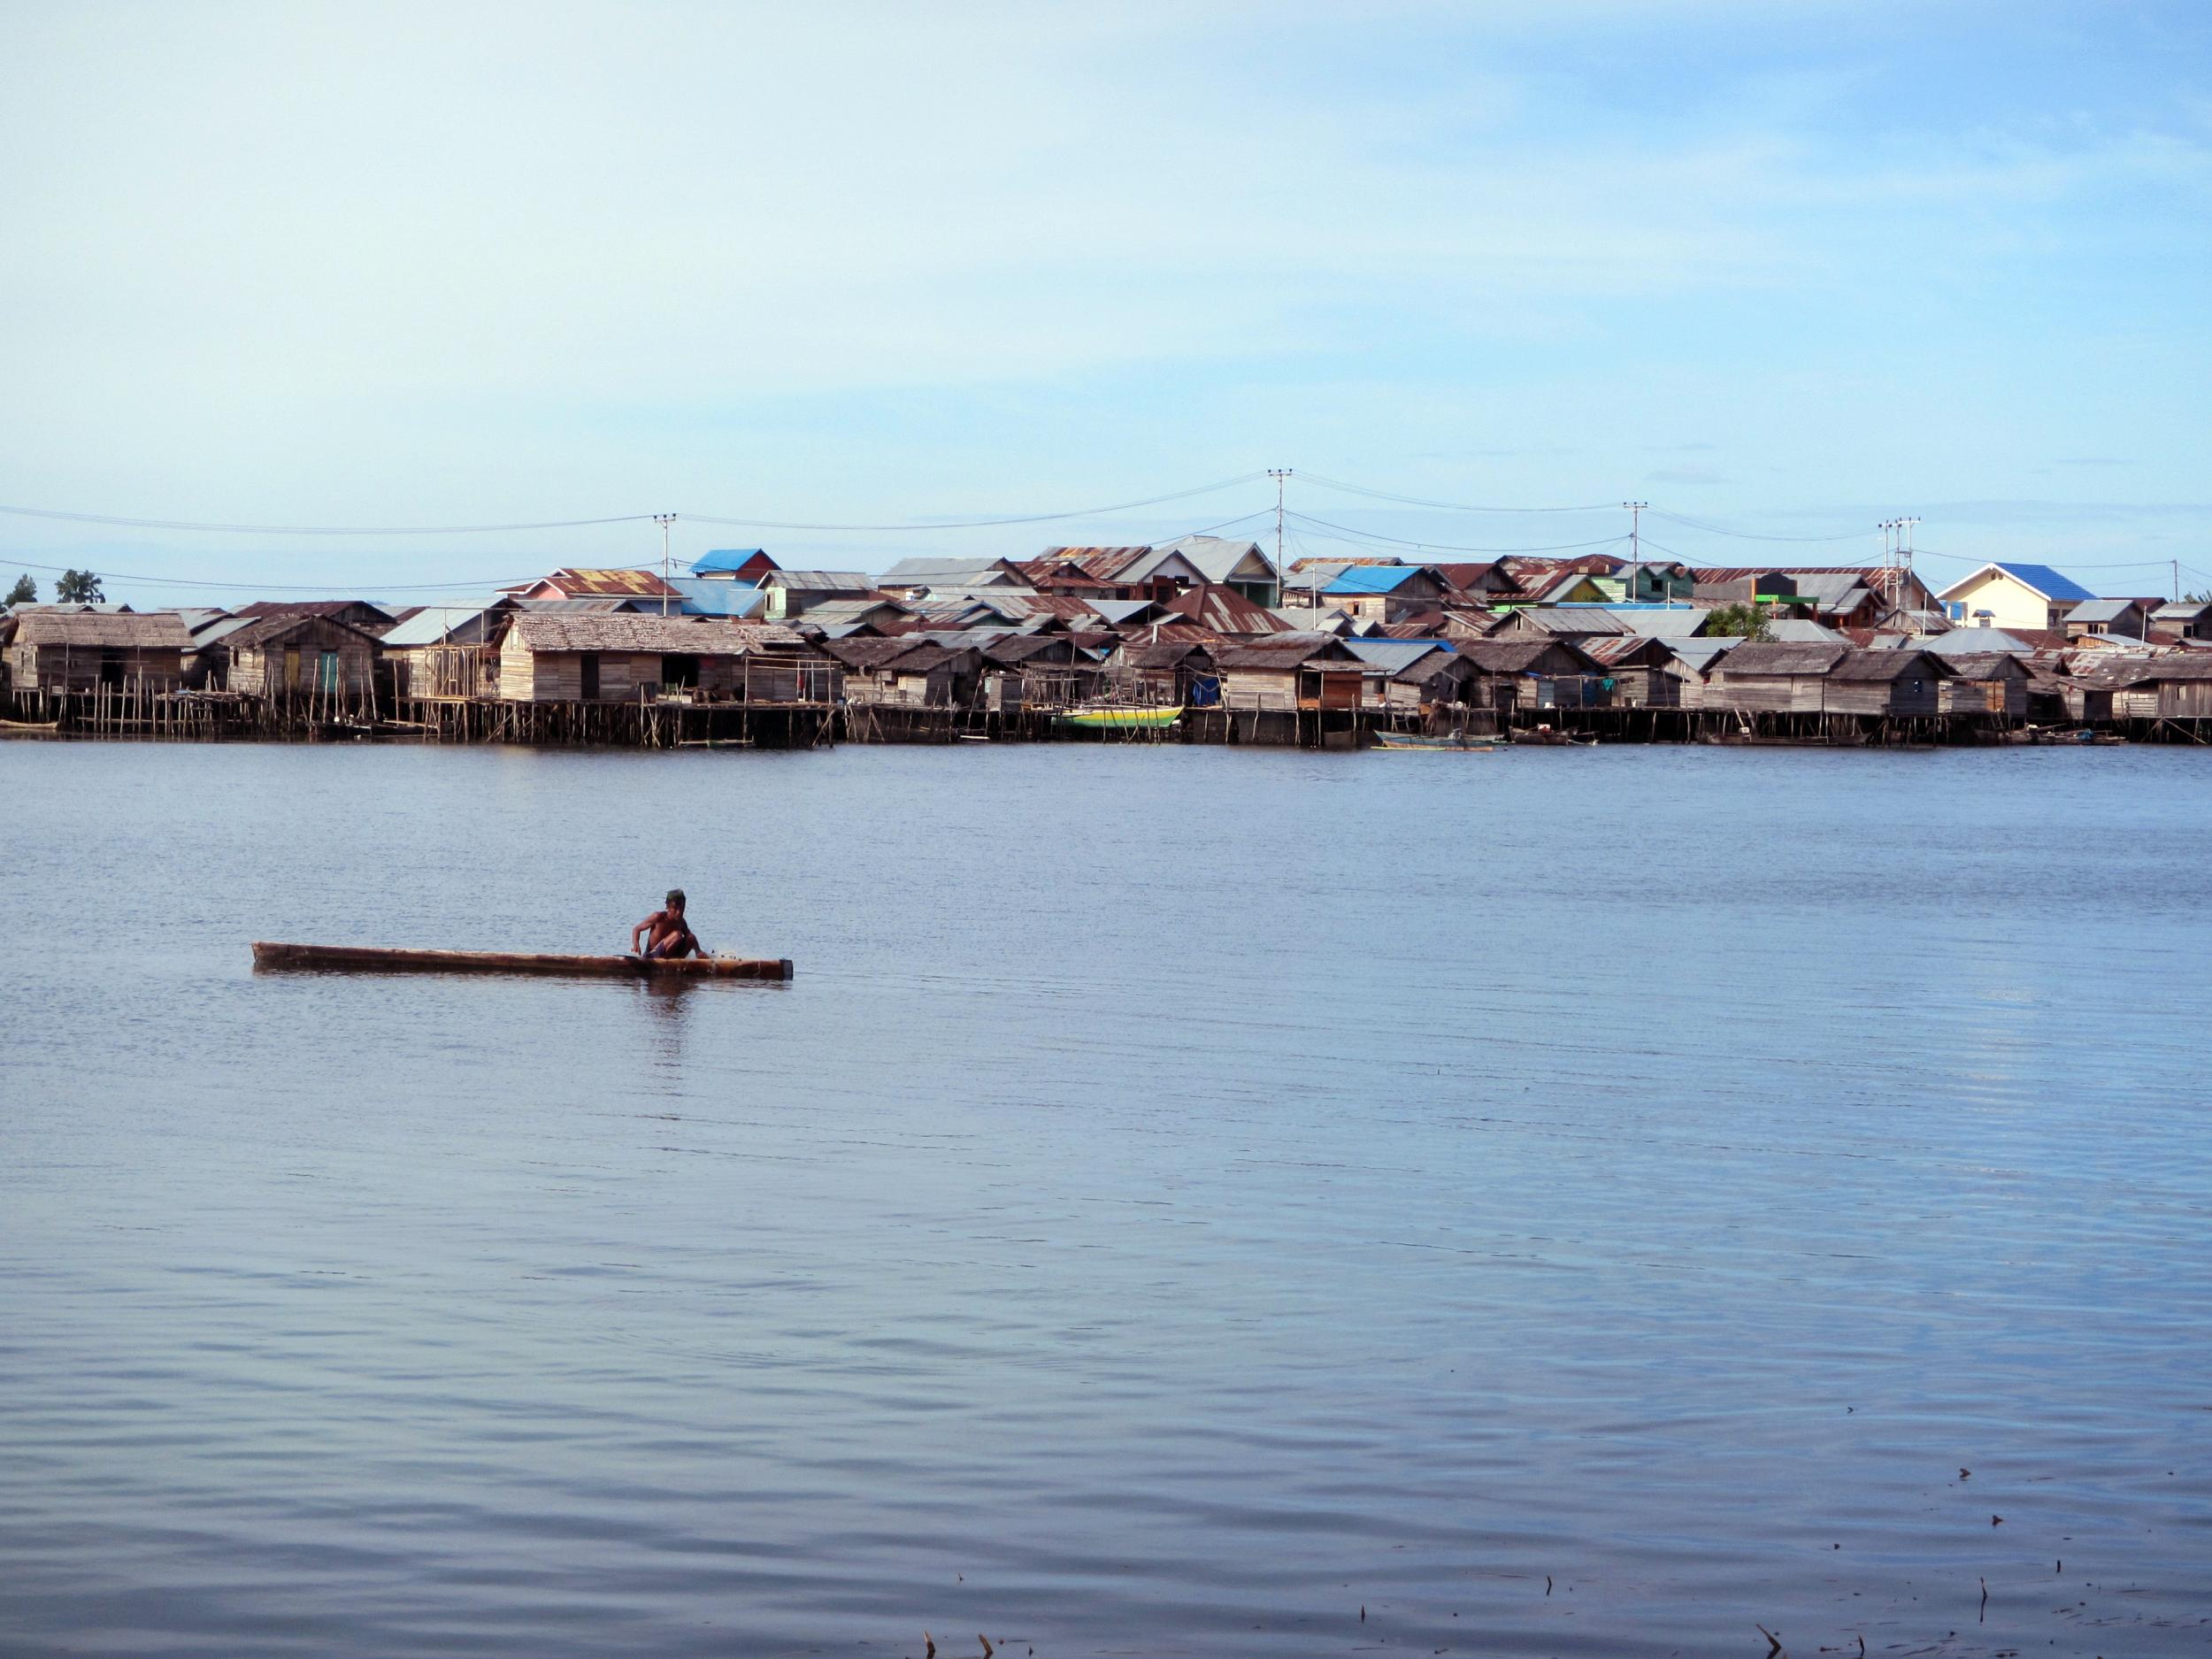 The Bajau village of Jaya Bakti